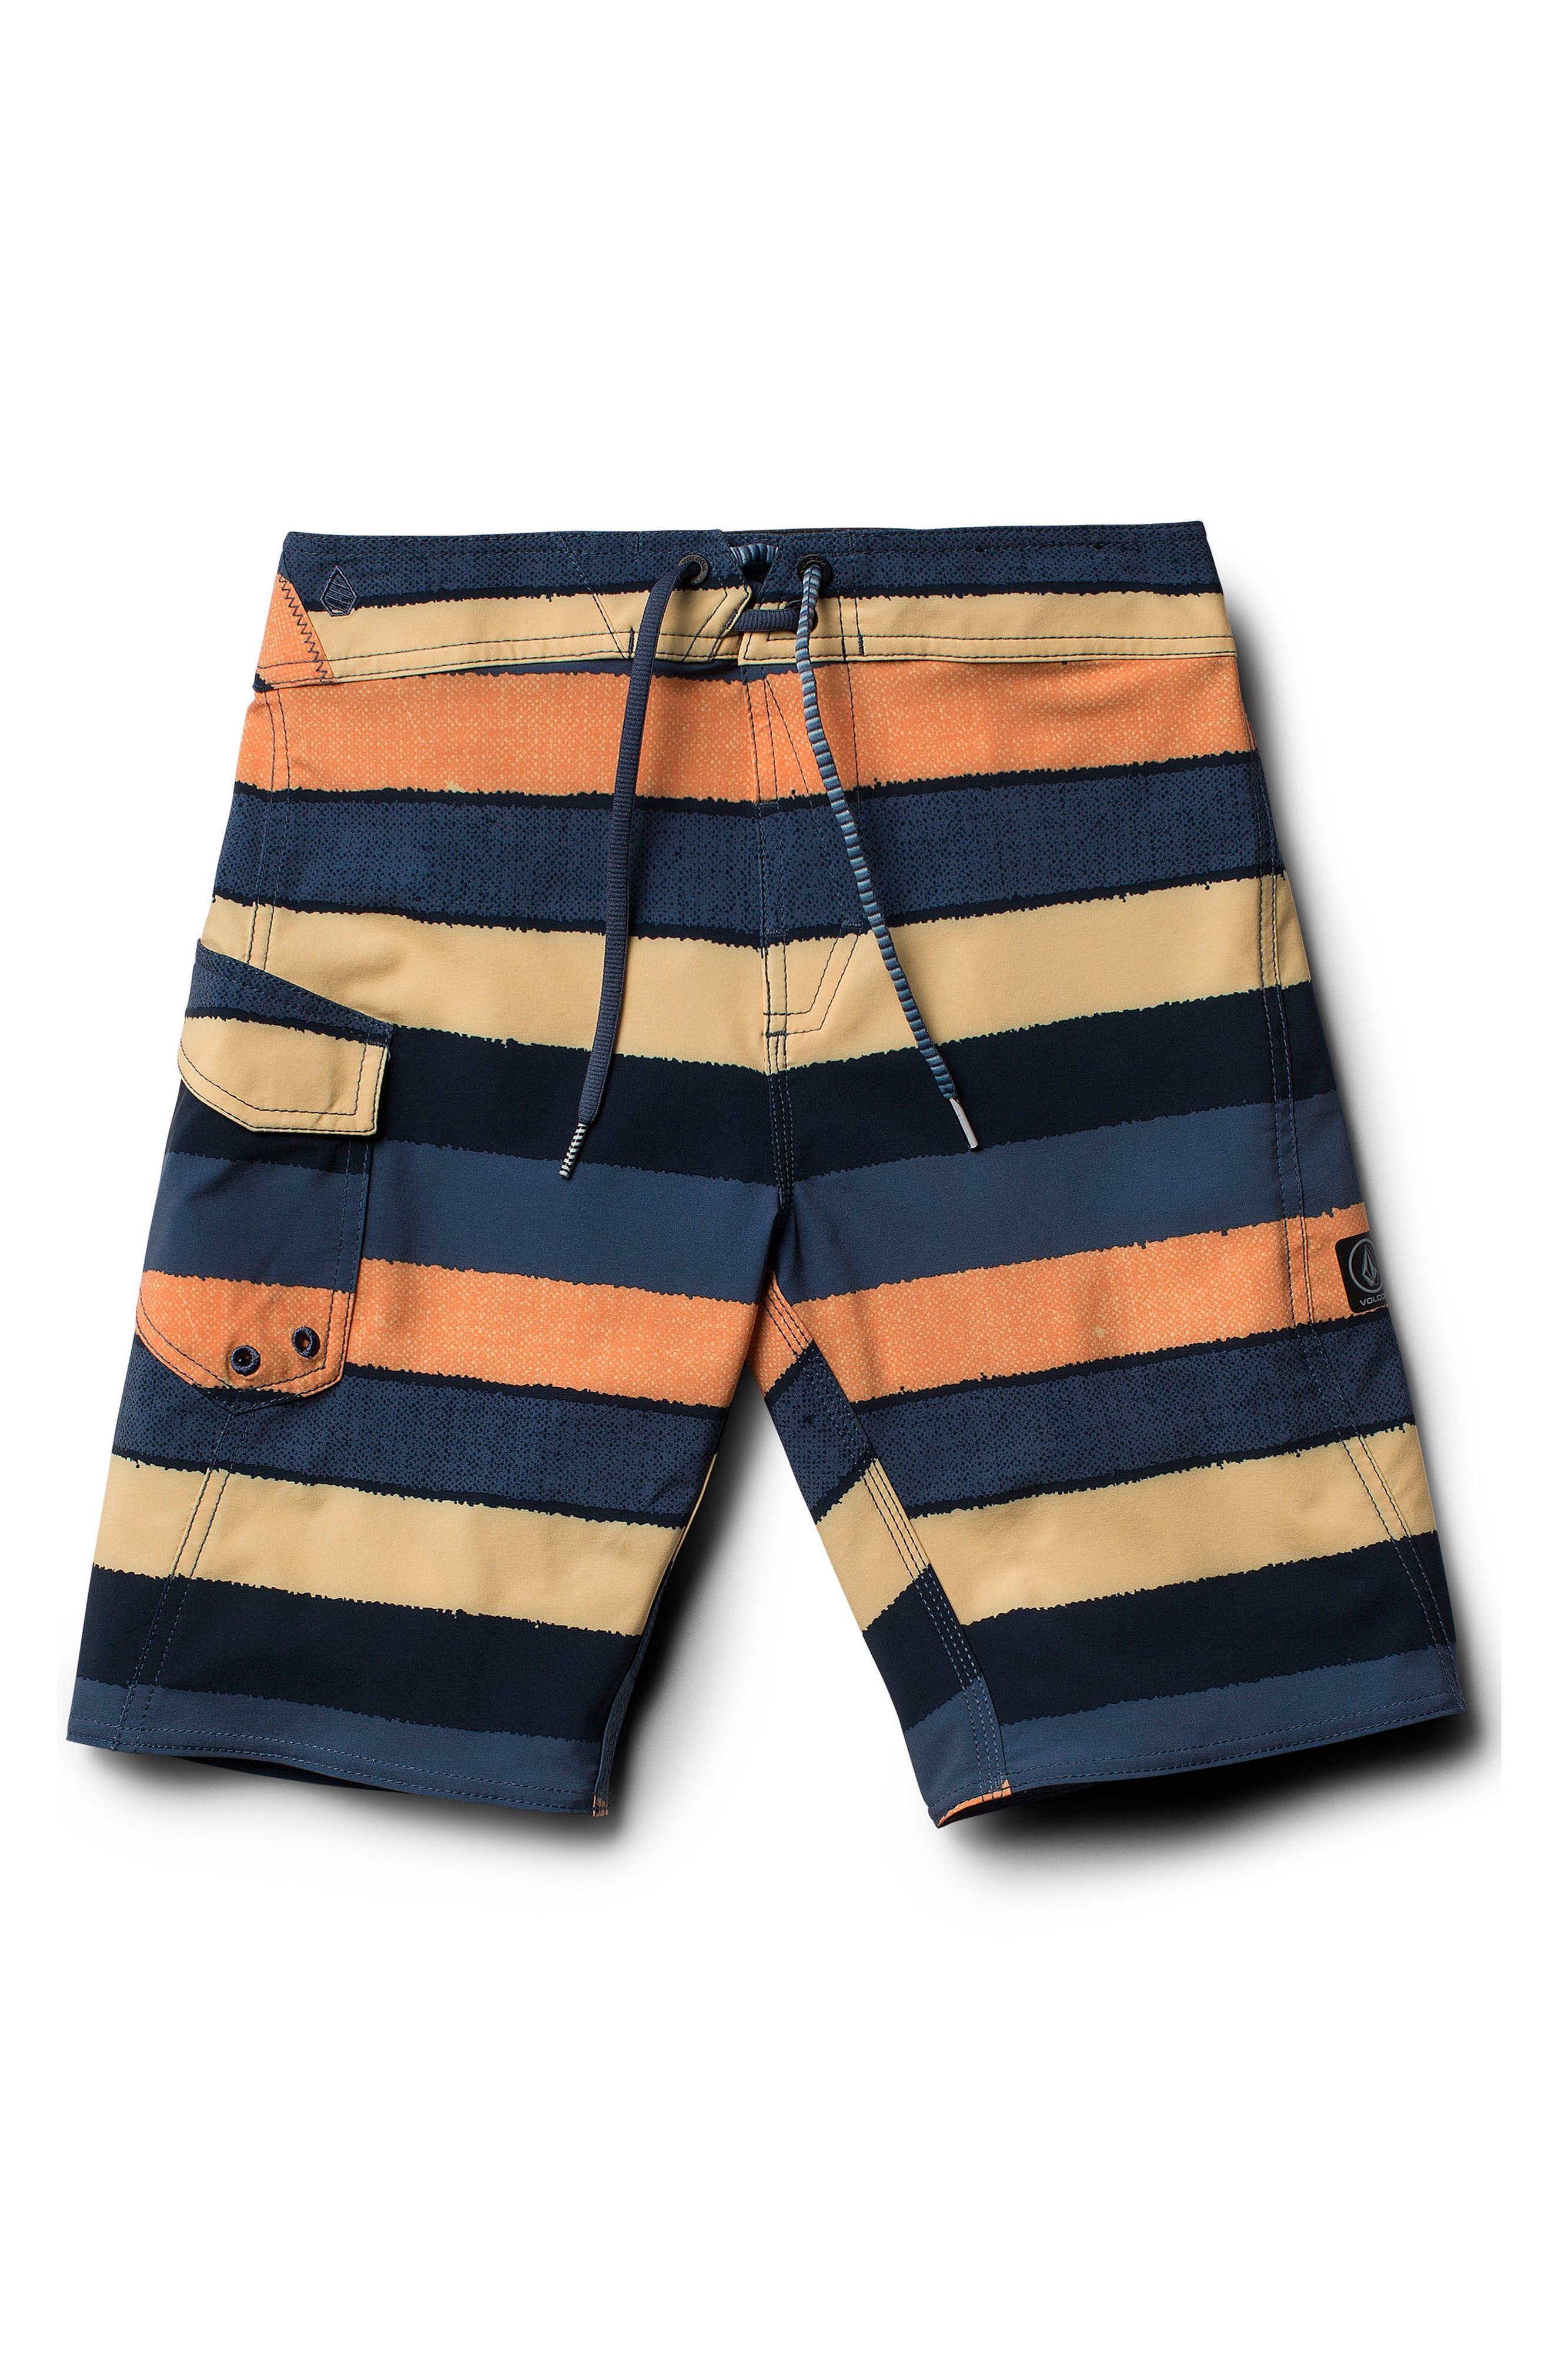 Magnetic Liney Mod Board Shorts,                         Main,                         color, Sunburst